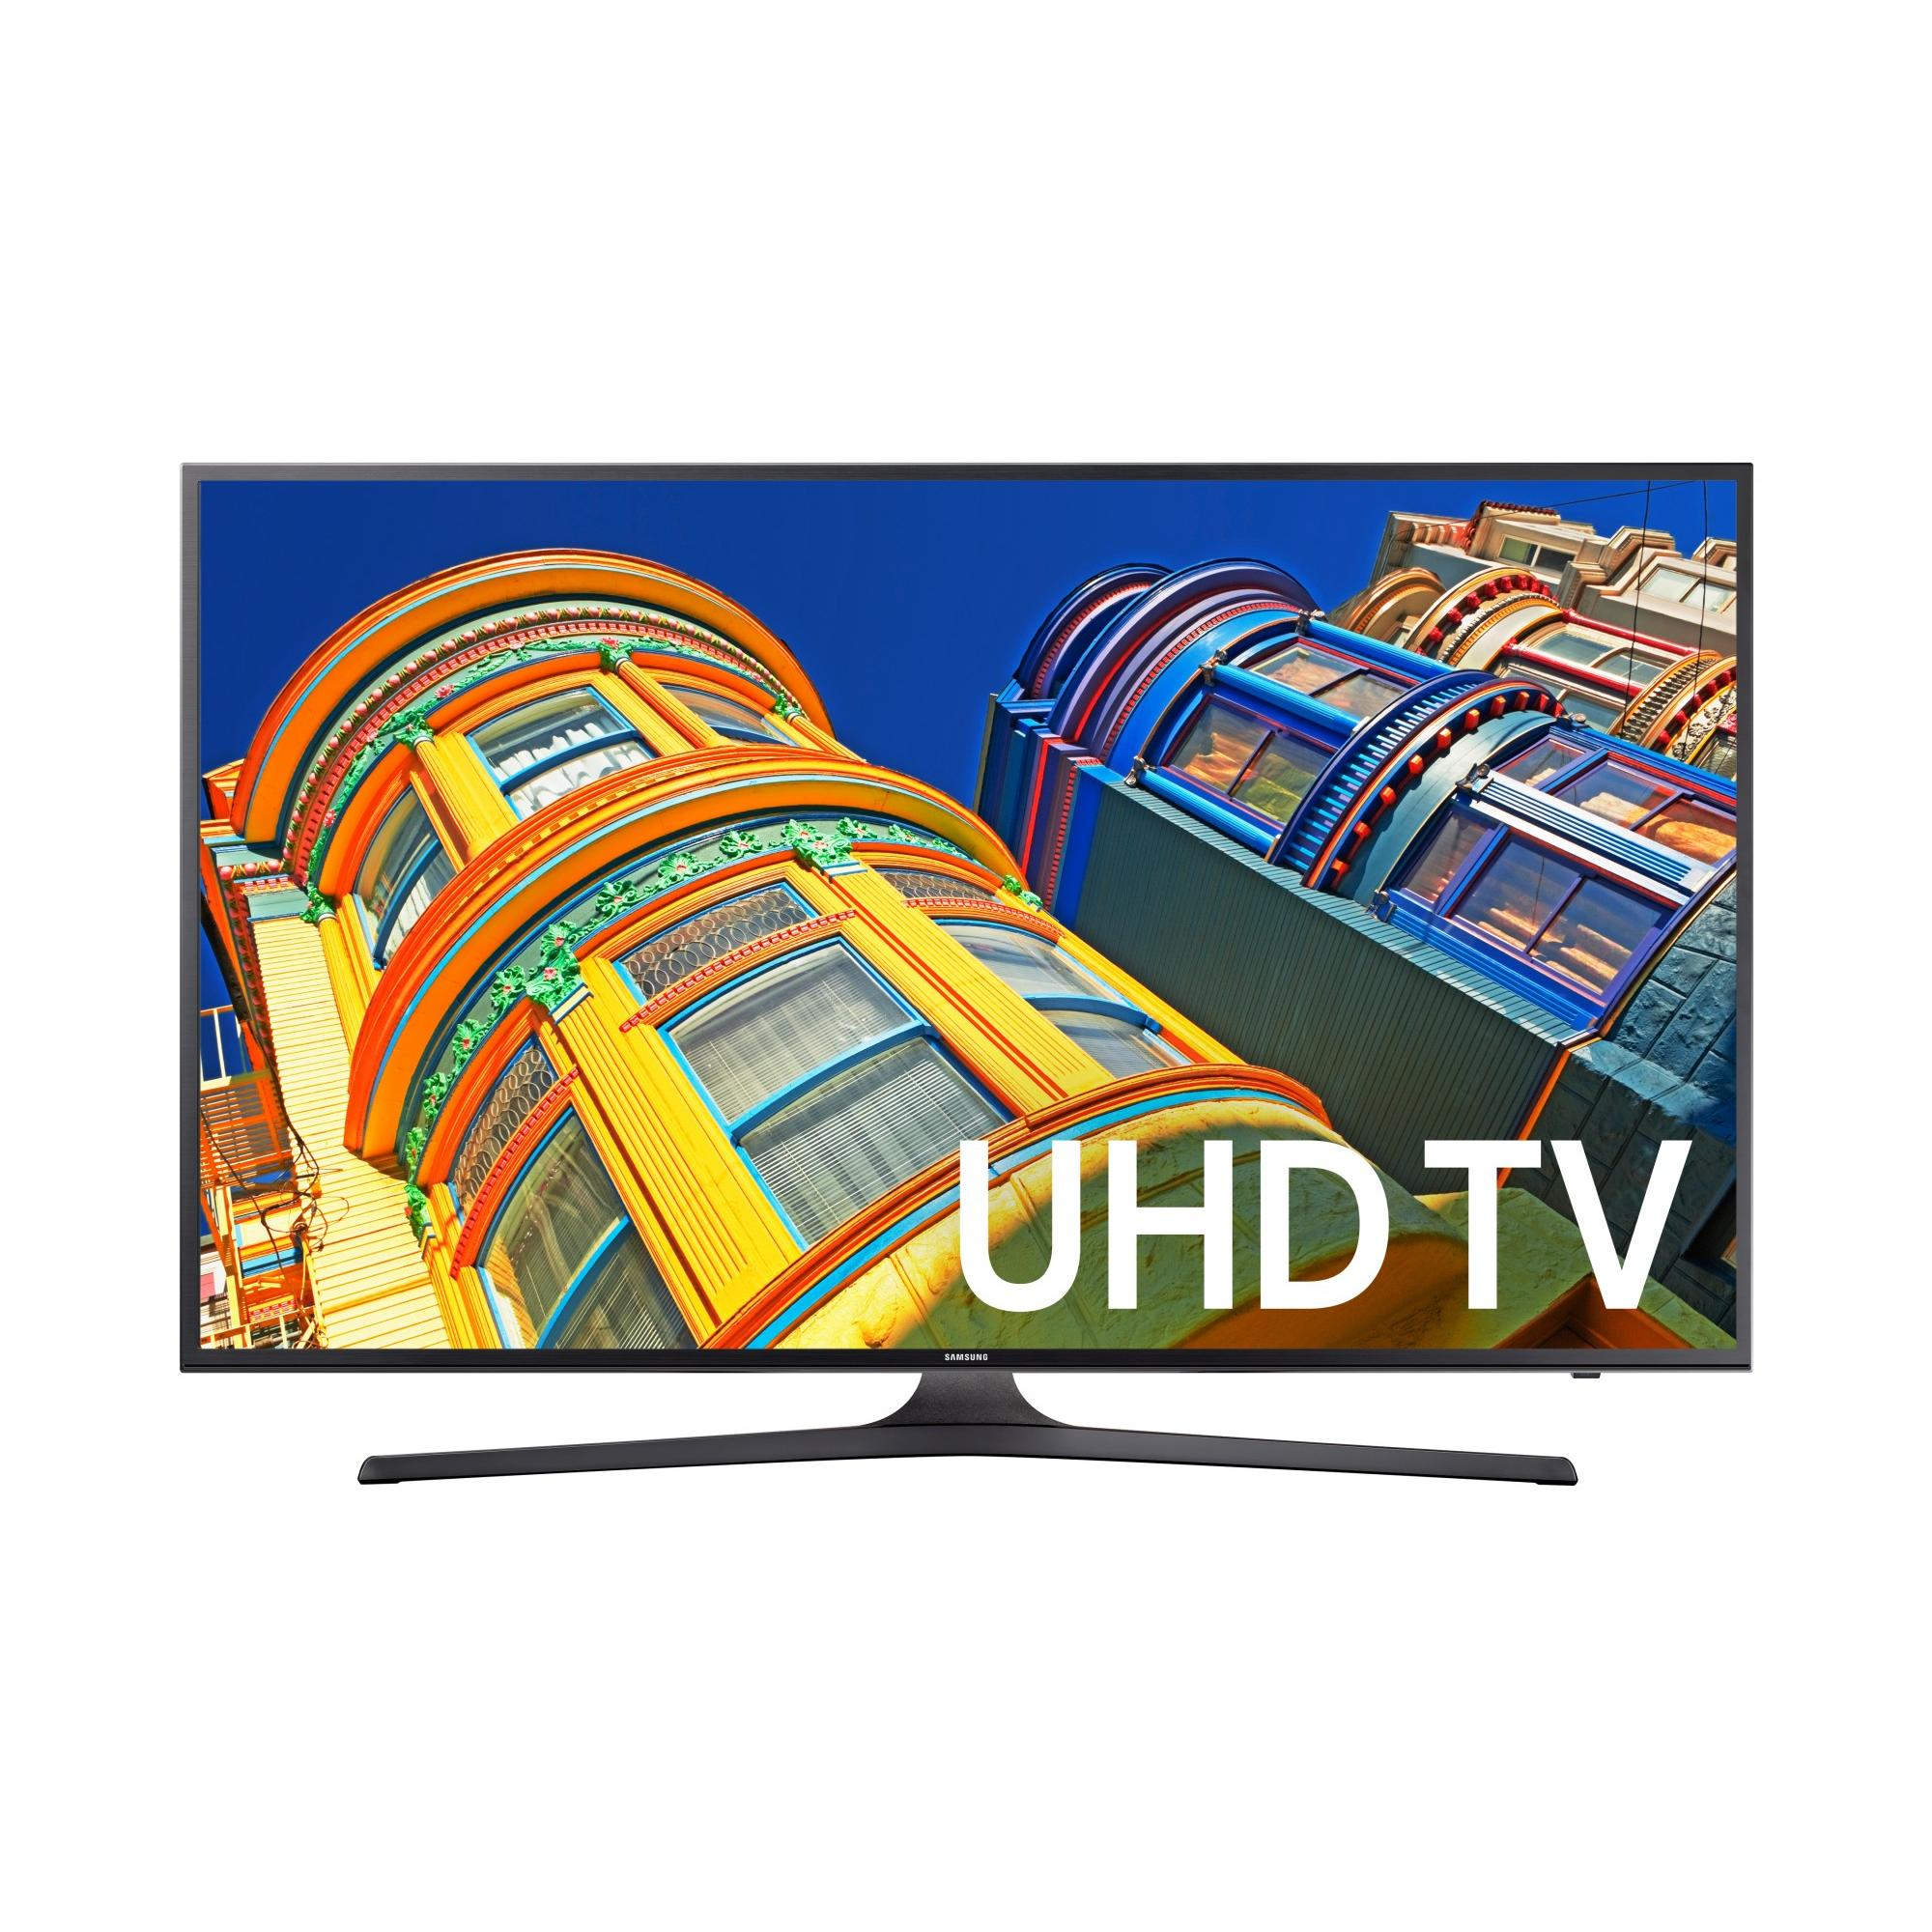 "Samsung 70"" Class 4K (2160P) Ultra HD Smart LED TV (UN70KU6300FXZA)"